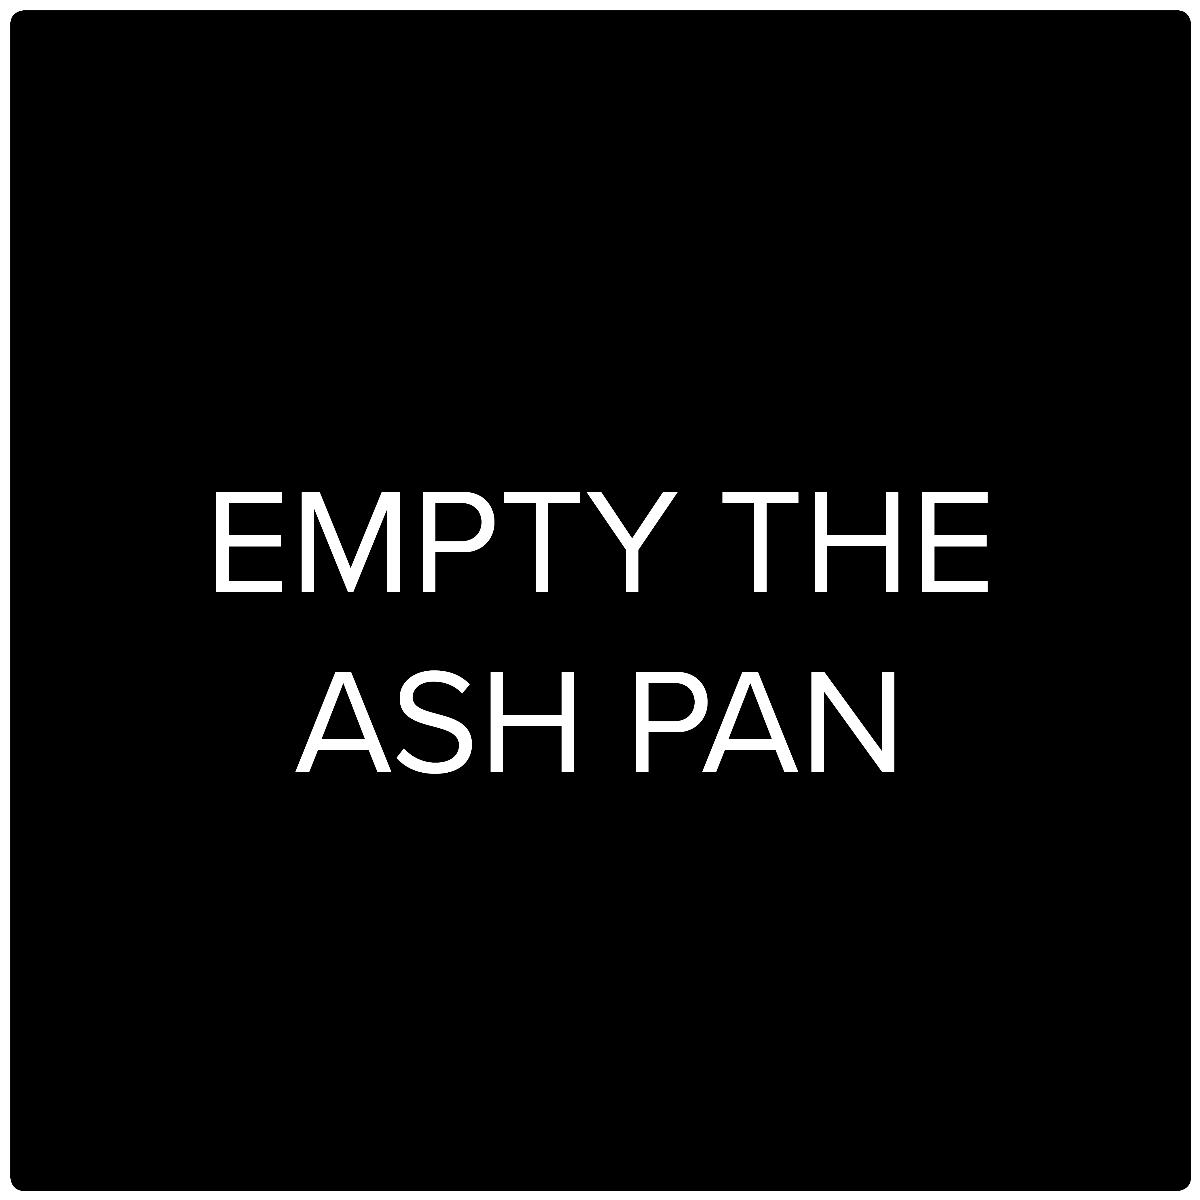 HWAM Video: Empty the ash pan